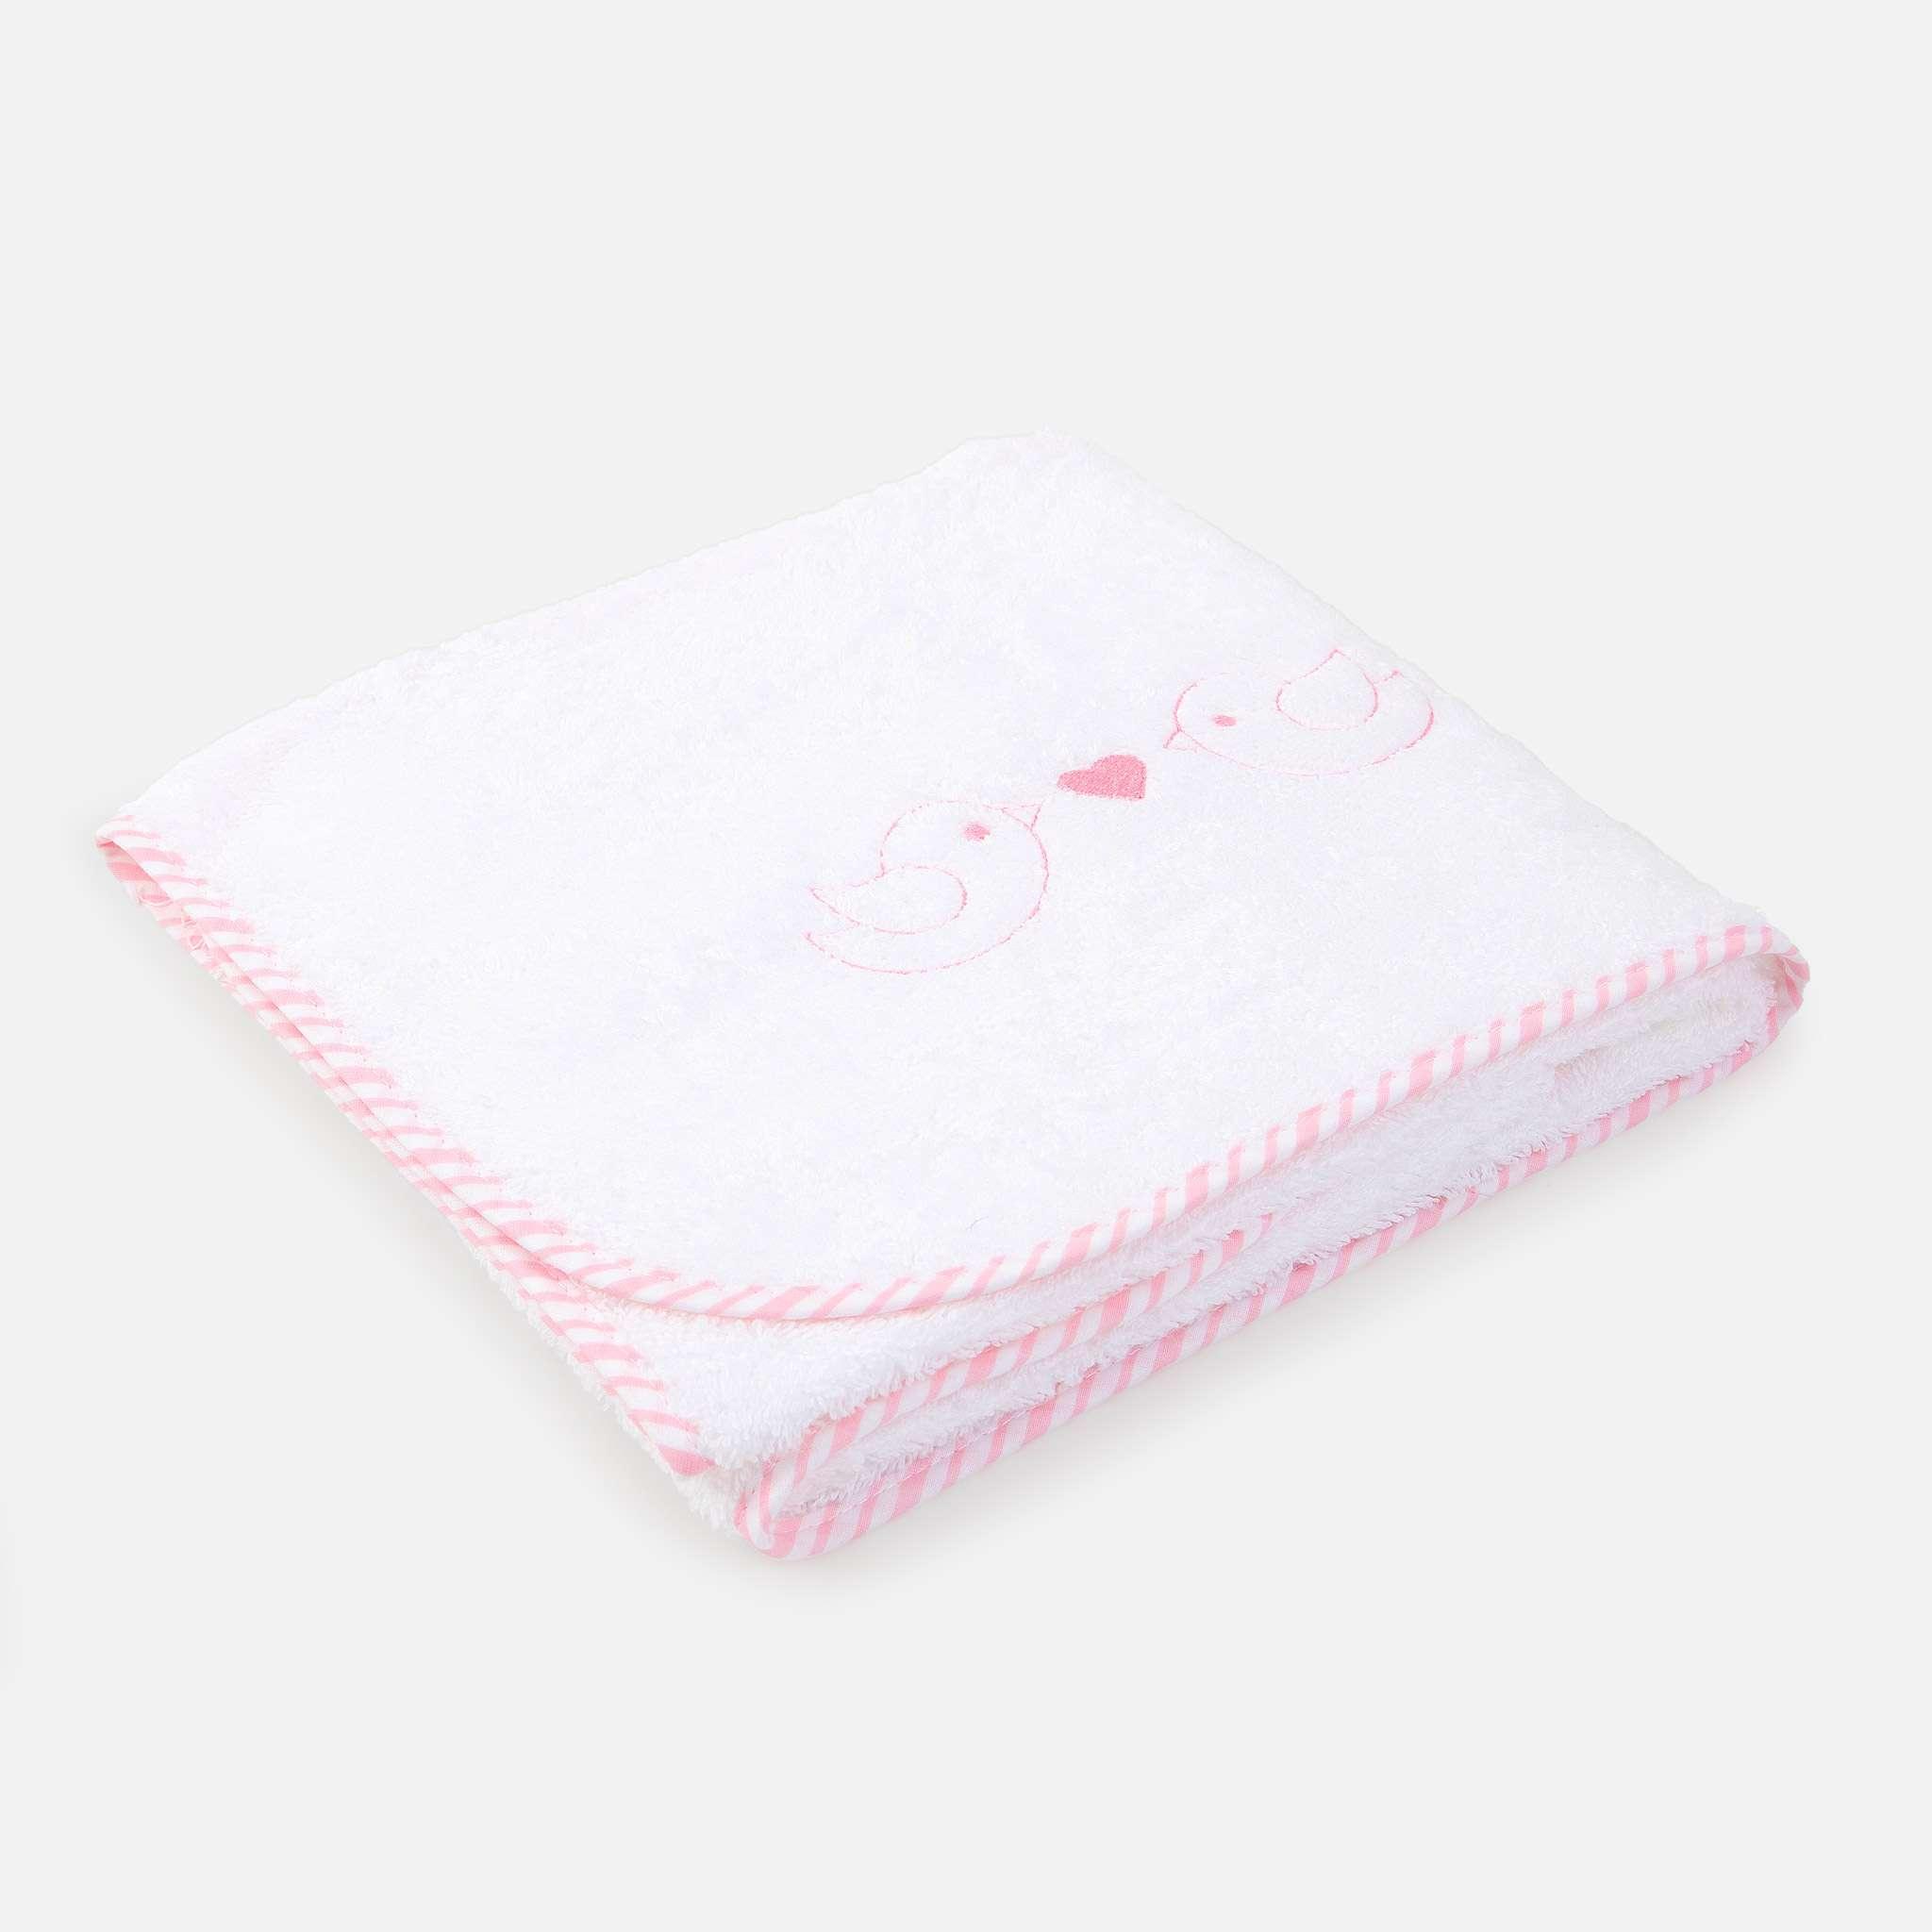 Ballon Pink handduk 72x72 cm